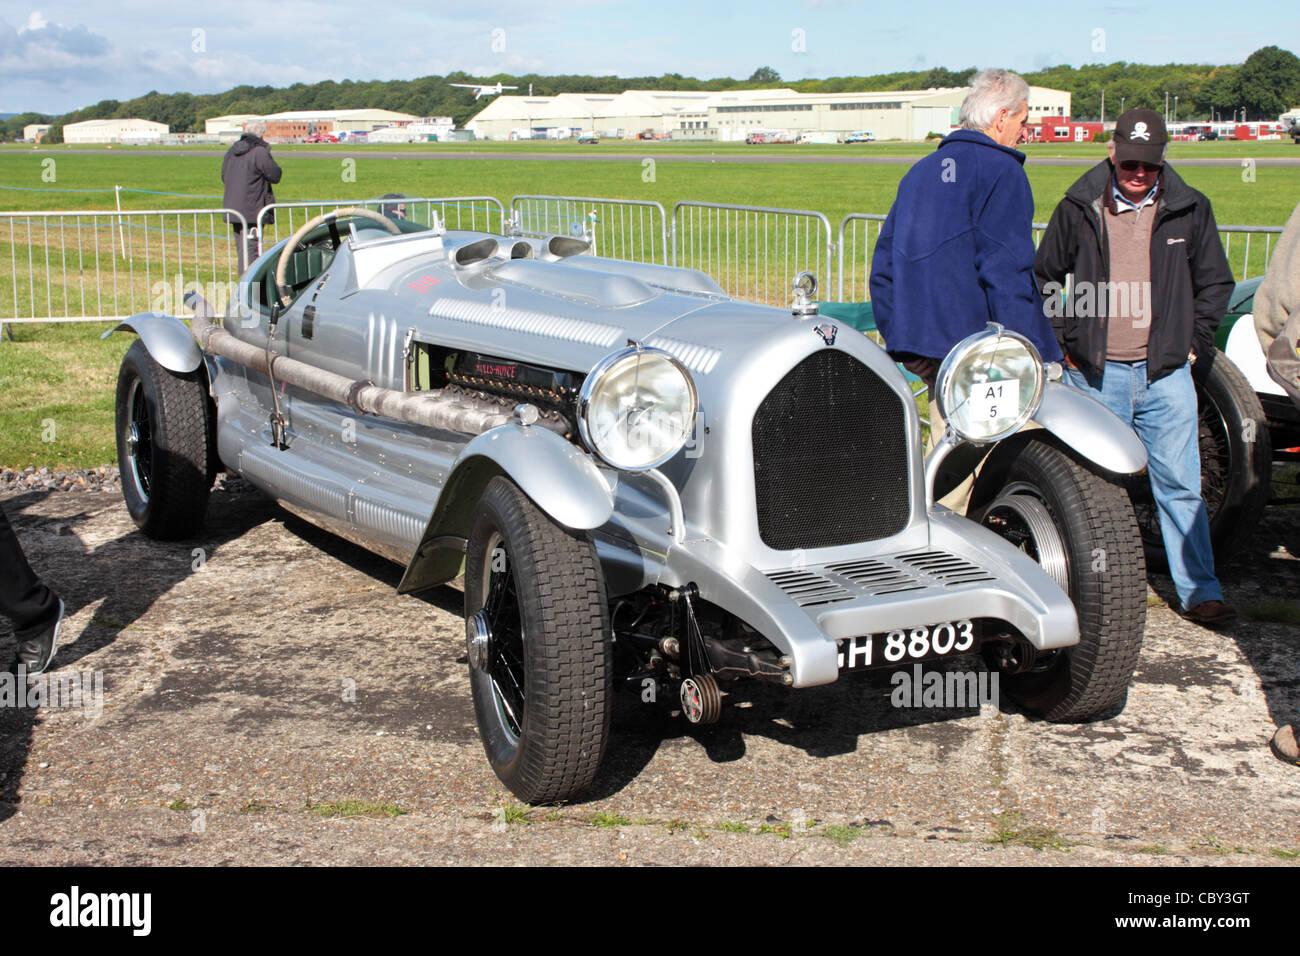 Rolls Royce Handlye Special GH 8803 - Stock Image